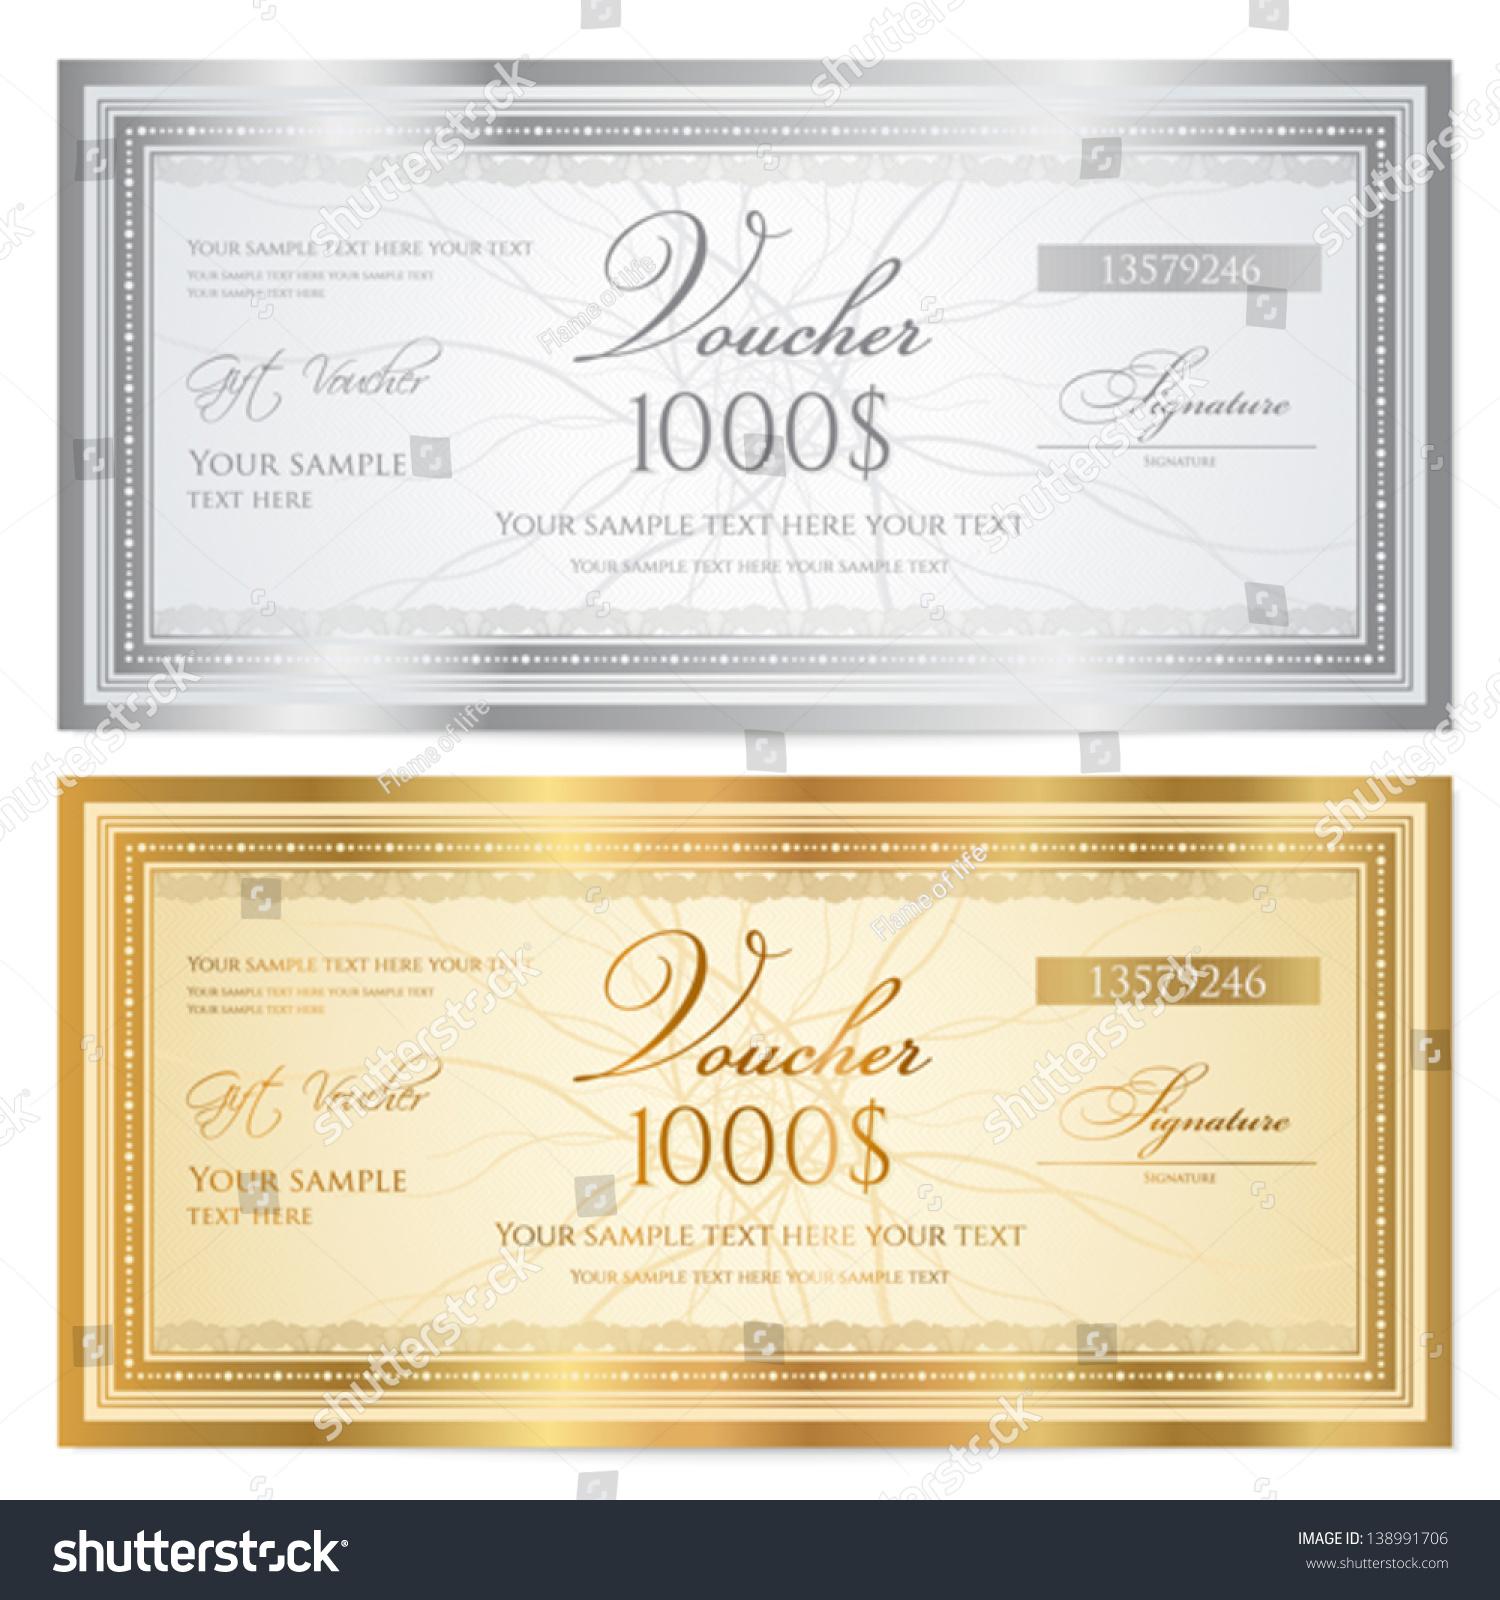 Voucher Template Guilloche Pattern Watermarks Border Vector – Money Voucher Template